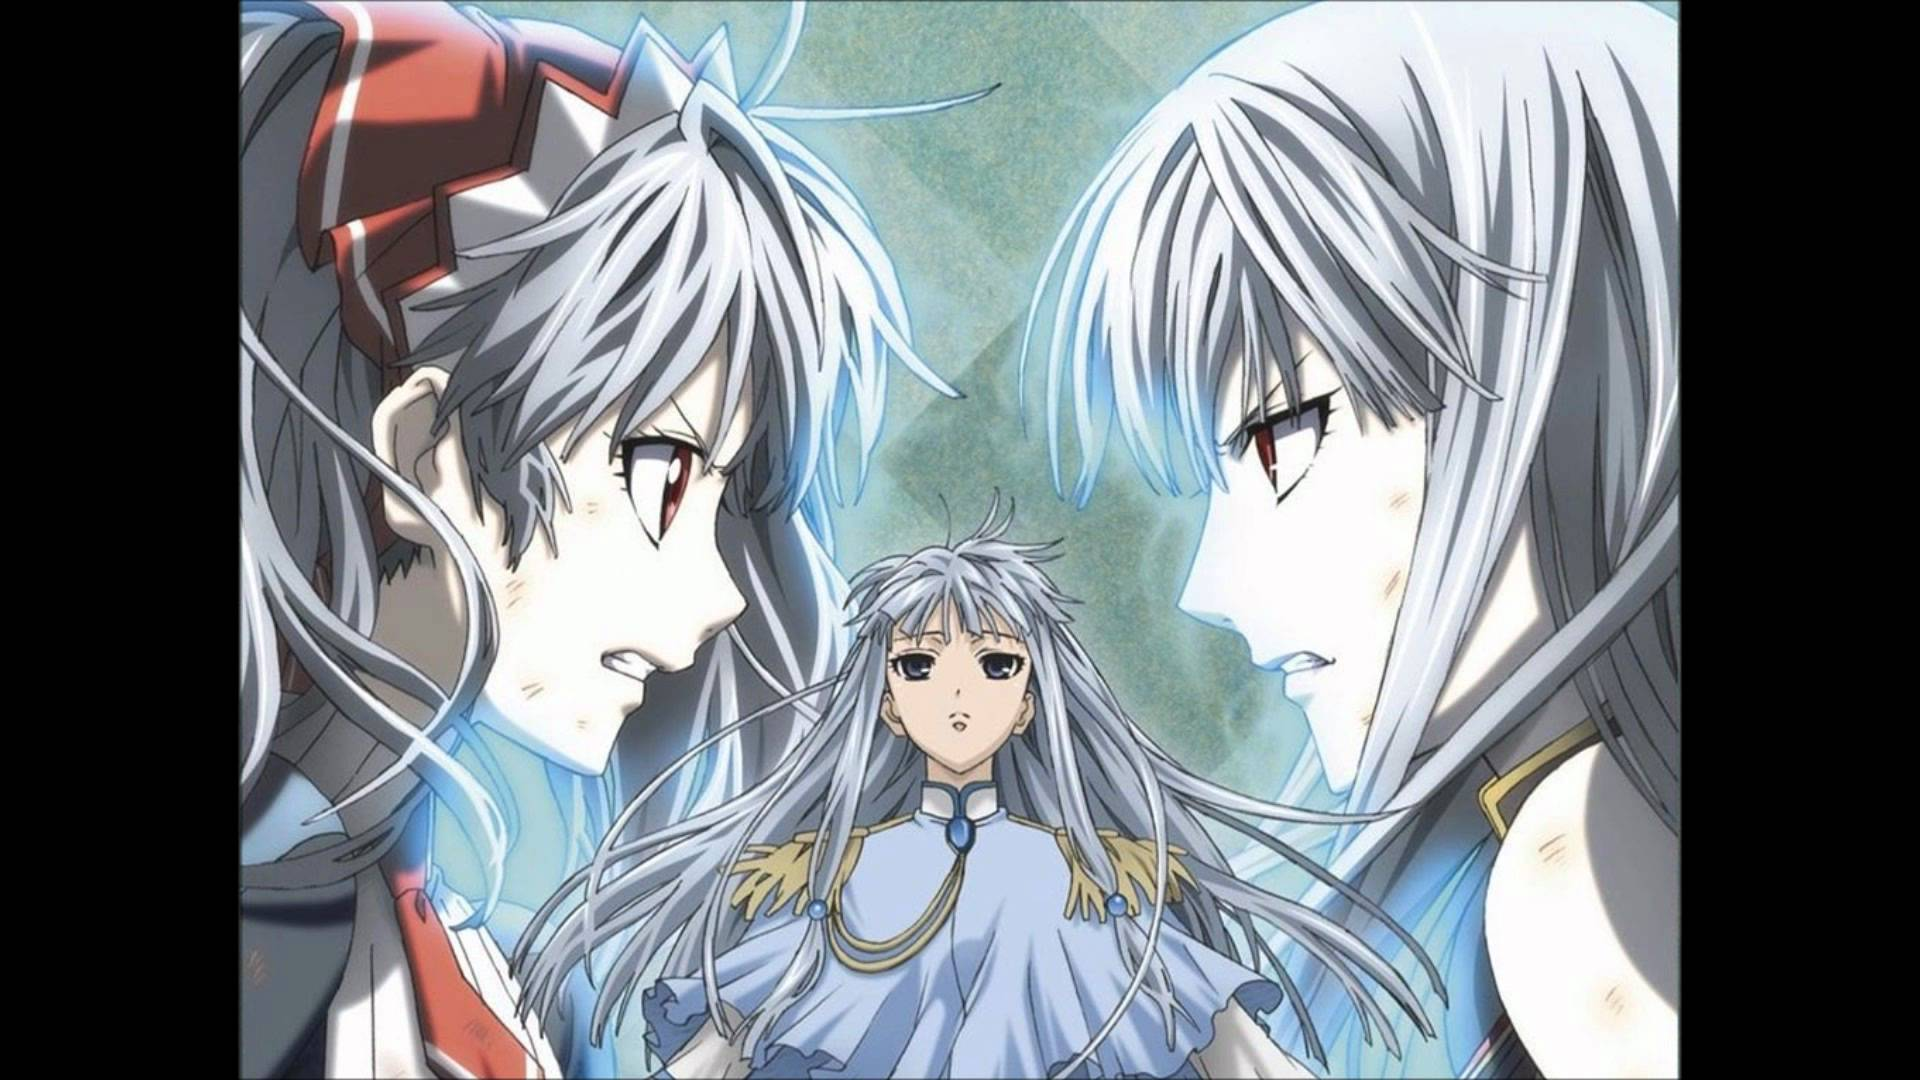 best supernatural romance anime seriesmaxresdefaultjpg tqRH2viU